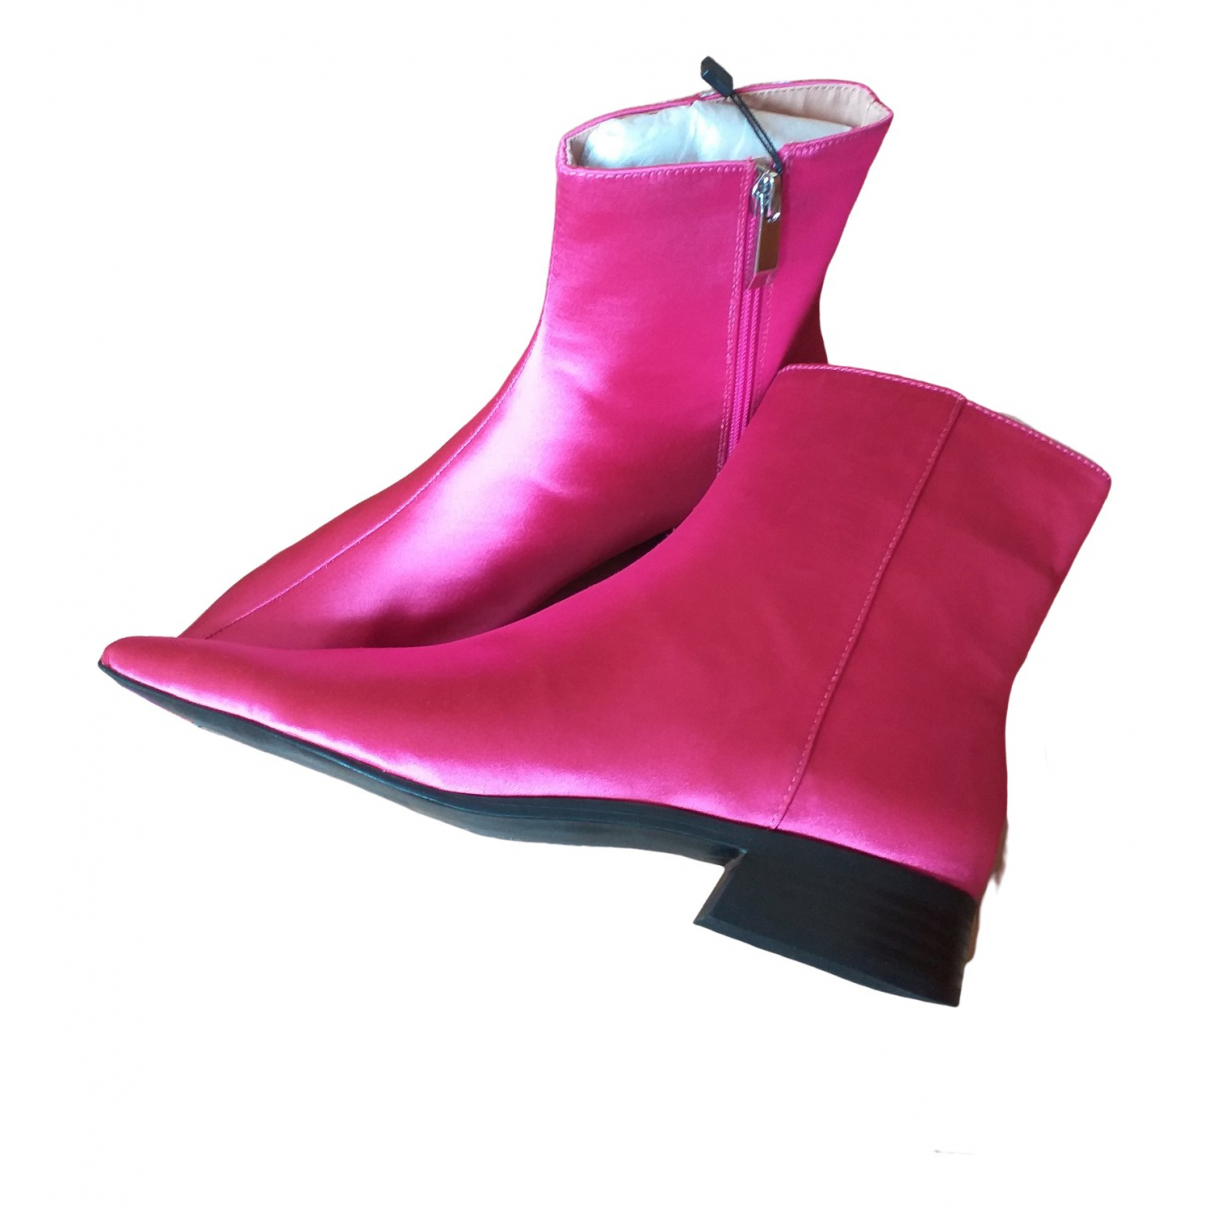 Zara - Bottes   pour femme en toile - rose